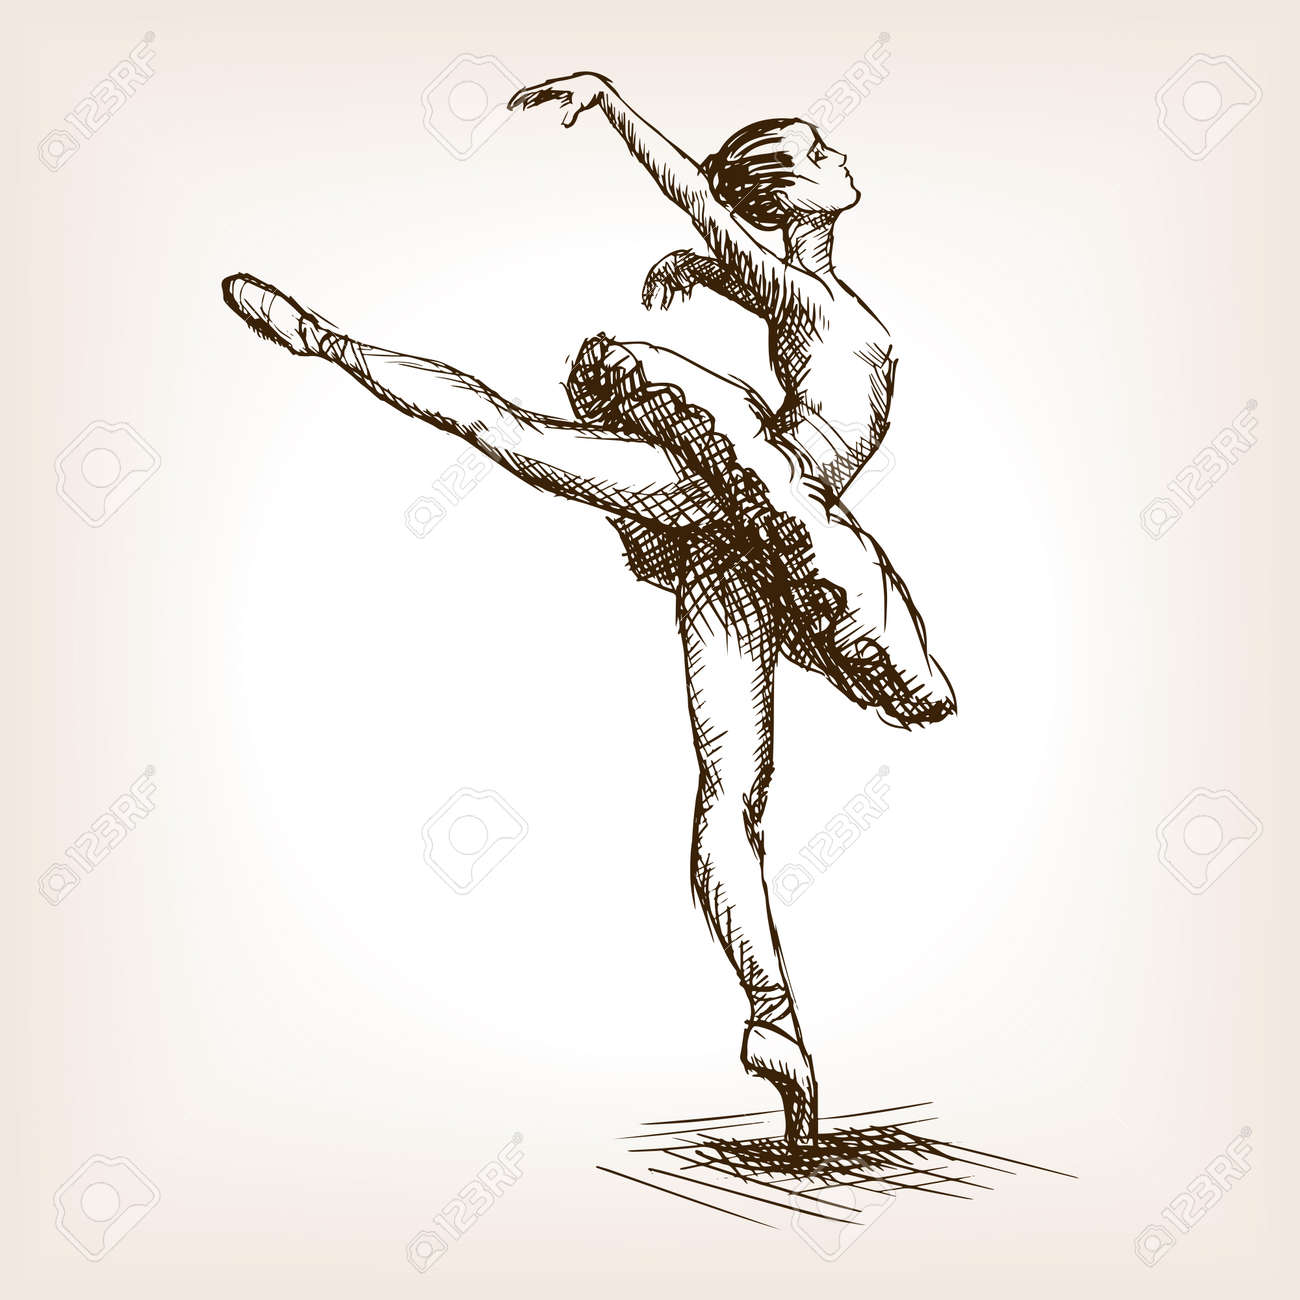 Ilustración Vectorial De Estilo De Dibujo Niña Bailarina De Ballet